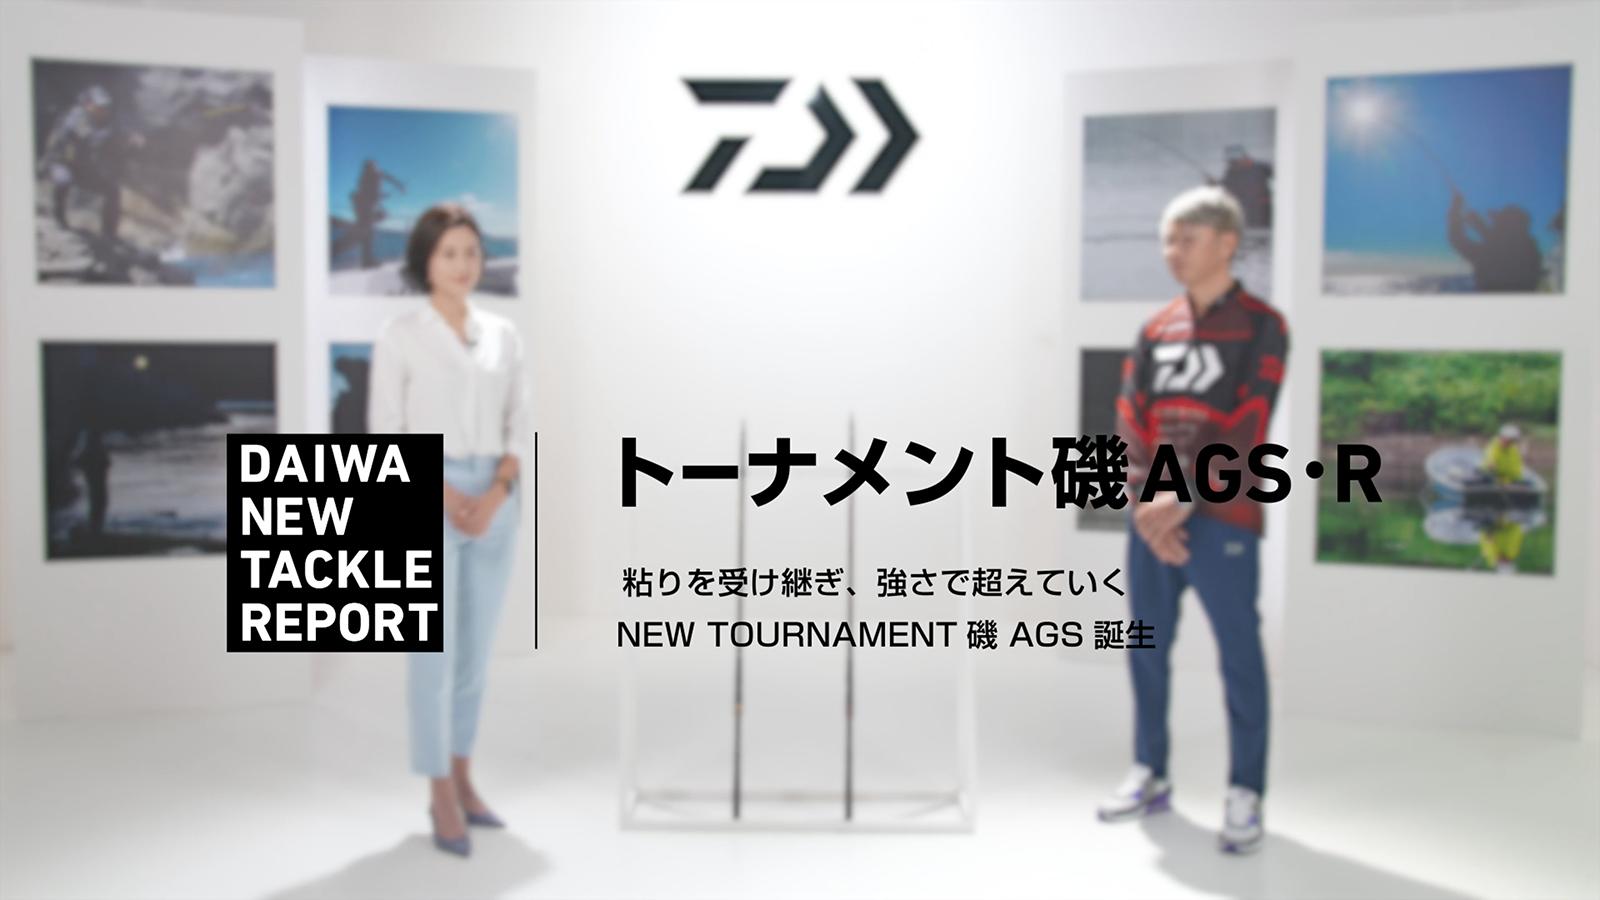 「DAIWA NEW TACKLE REPORT」トーナメント磯 AGS・R篇